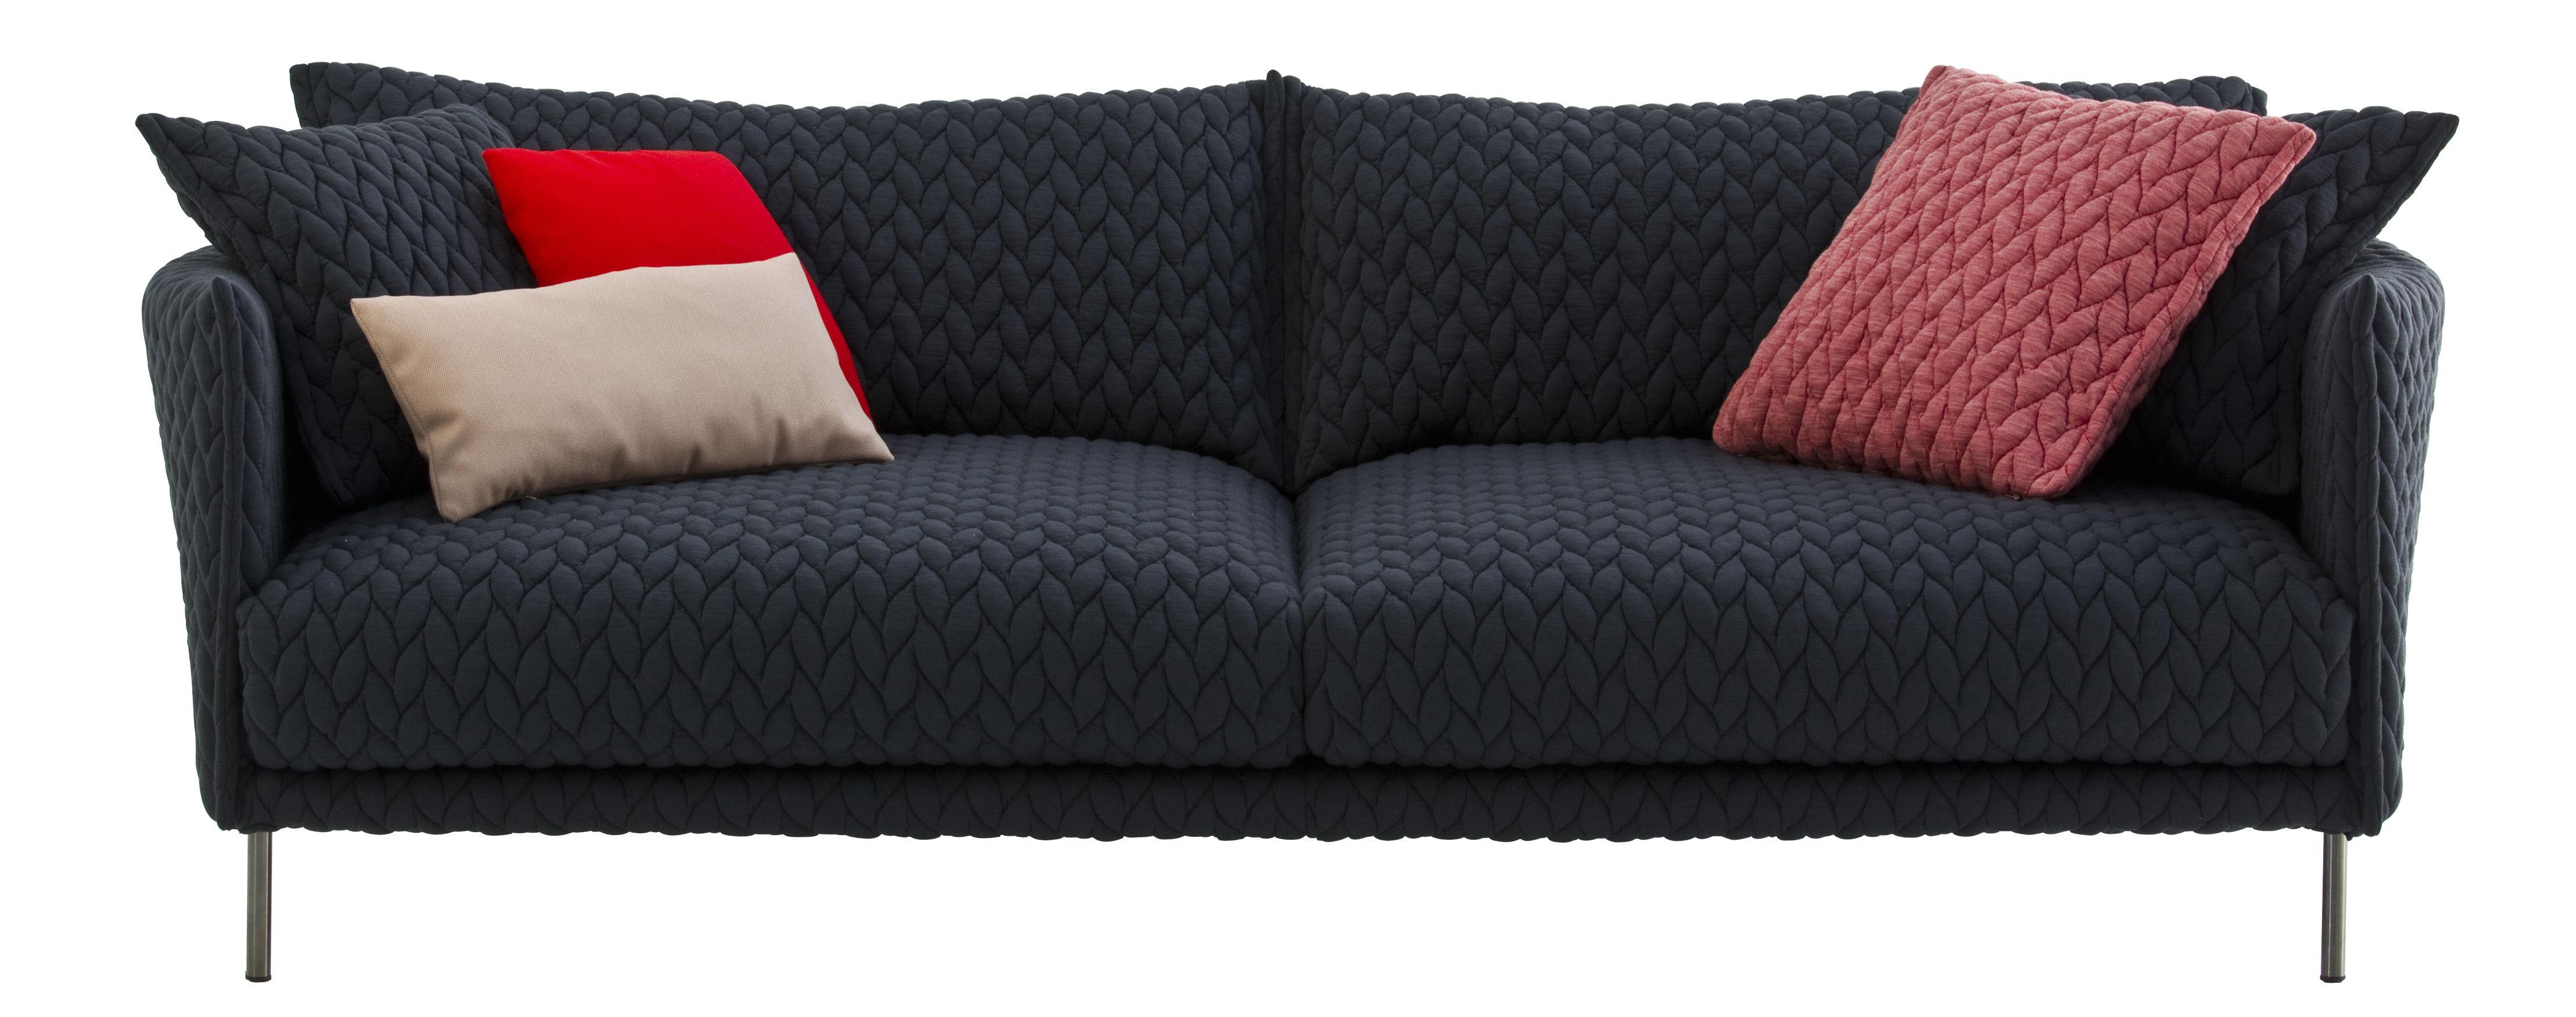 Möbel - Sofas - Gentry Sofa / L 240 cm - mit Stoffbezug - Moroso - Bezug dunkelgrau-blau / Füße dunkelgrau - Gänsedaune, Gewebe, lackierter Stahl, Polyurethan-Schaum